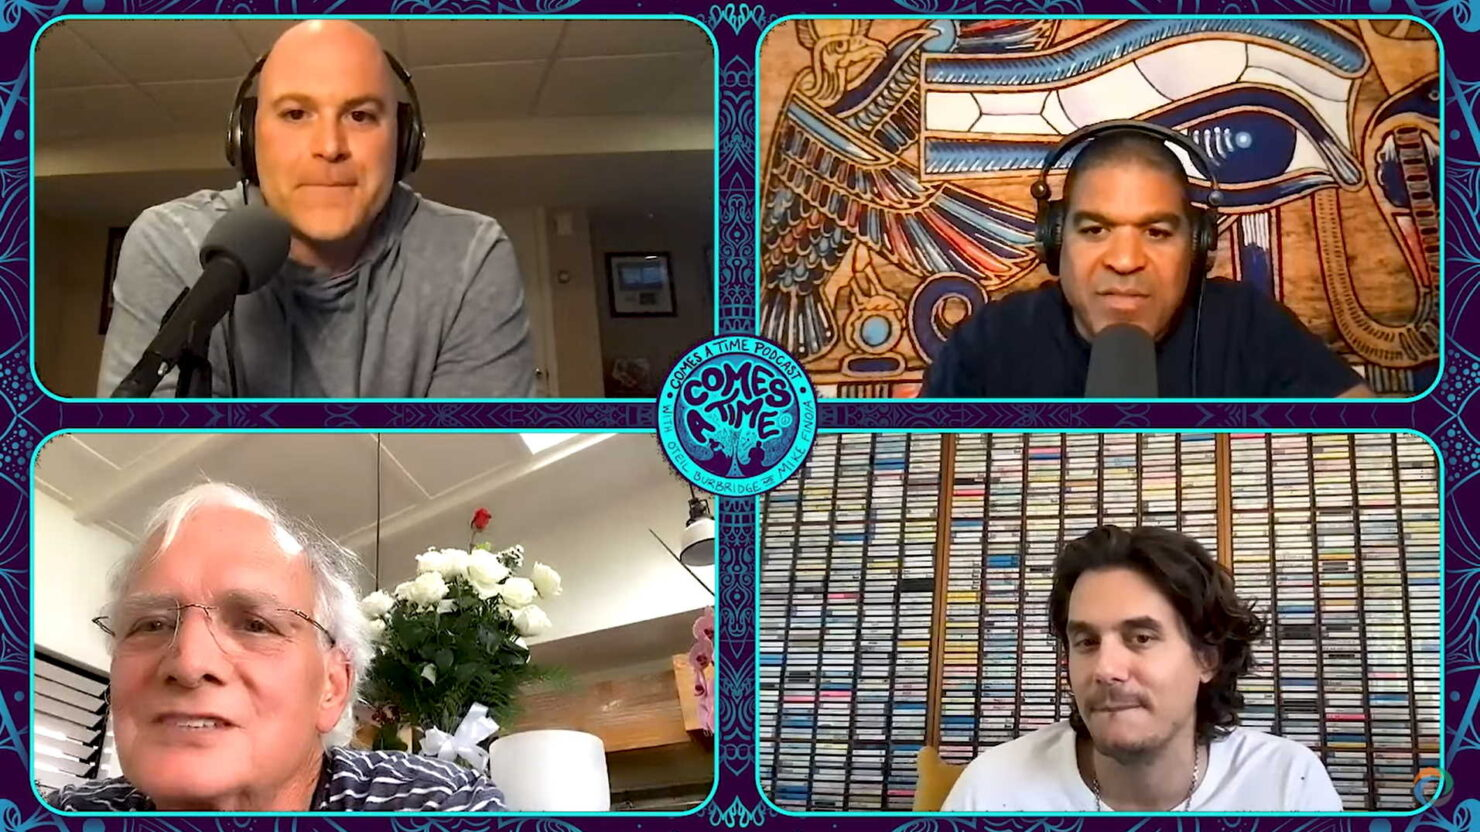 Dead & Company's John Mayer + Bill Kreutzmann Appear On 'Comes A Time' Podcast